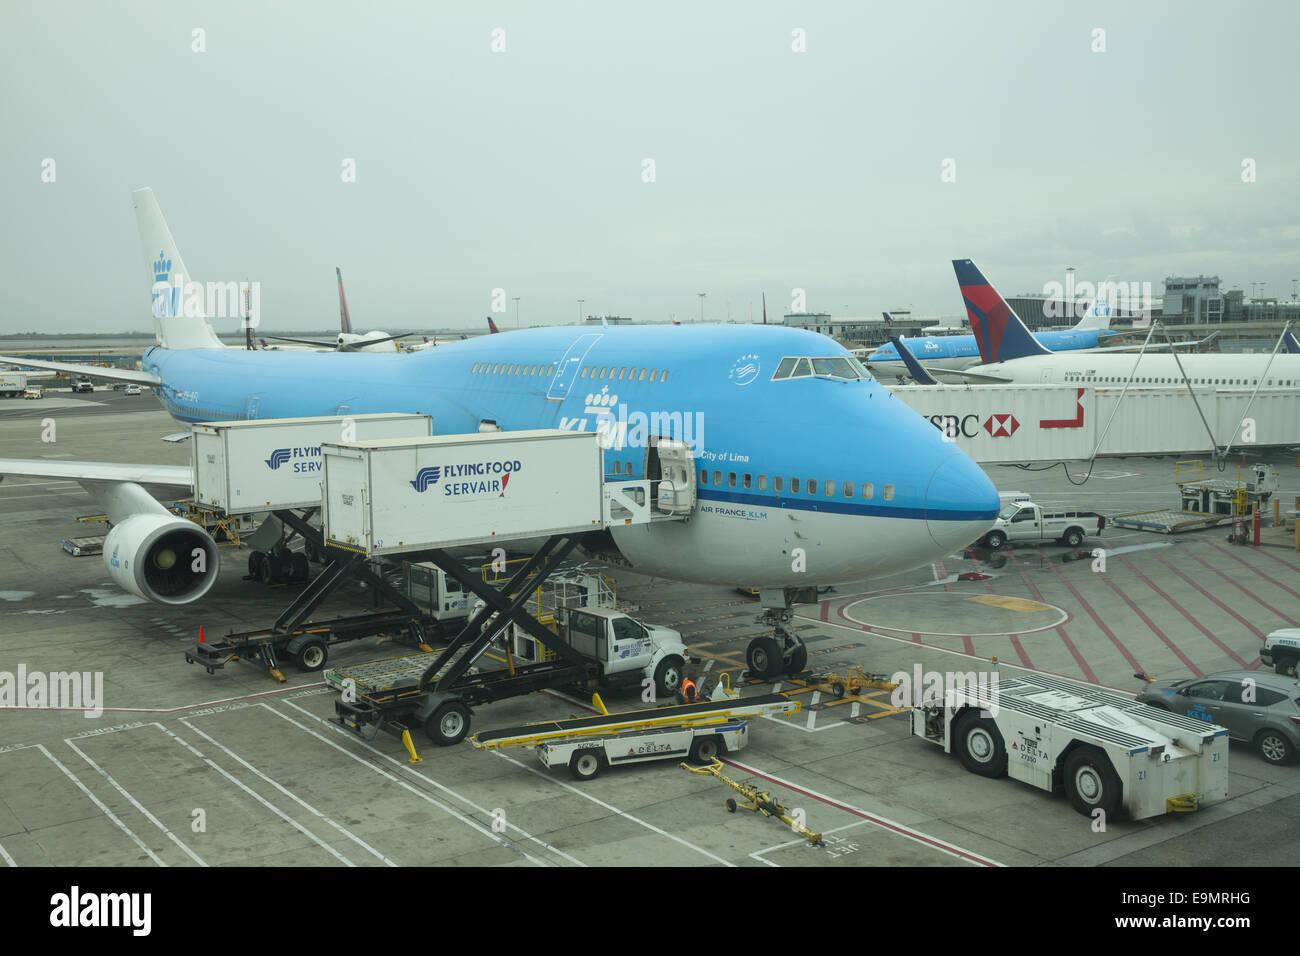 JFK International Airport in New York City. - Stock Image